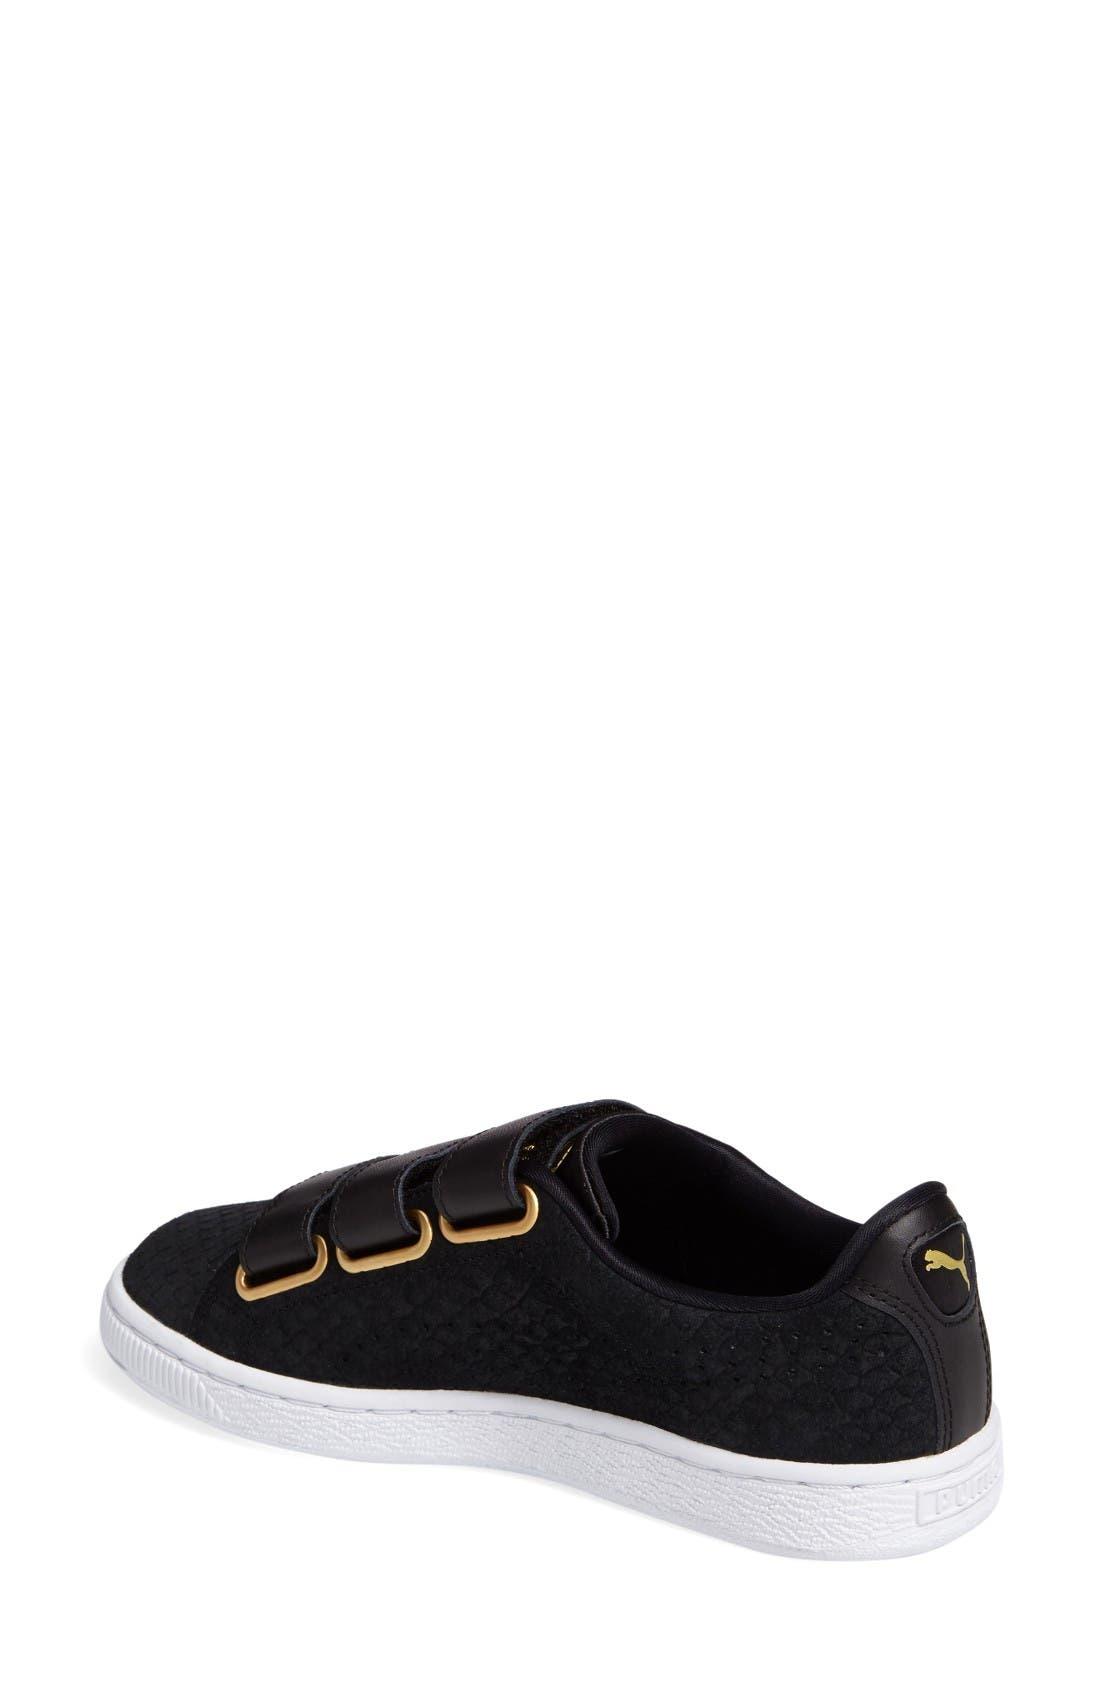 Alternate Image 2  - PUMA Basket Strap ExoticSkin Sneaker (Women)